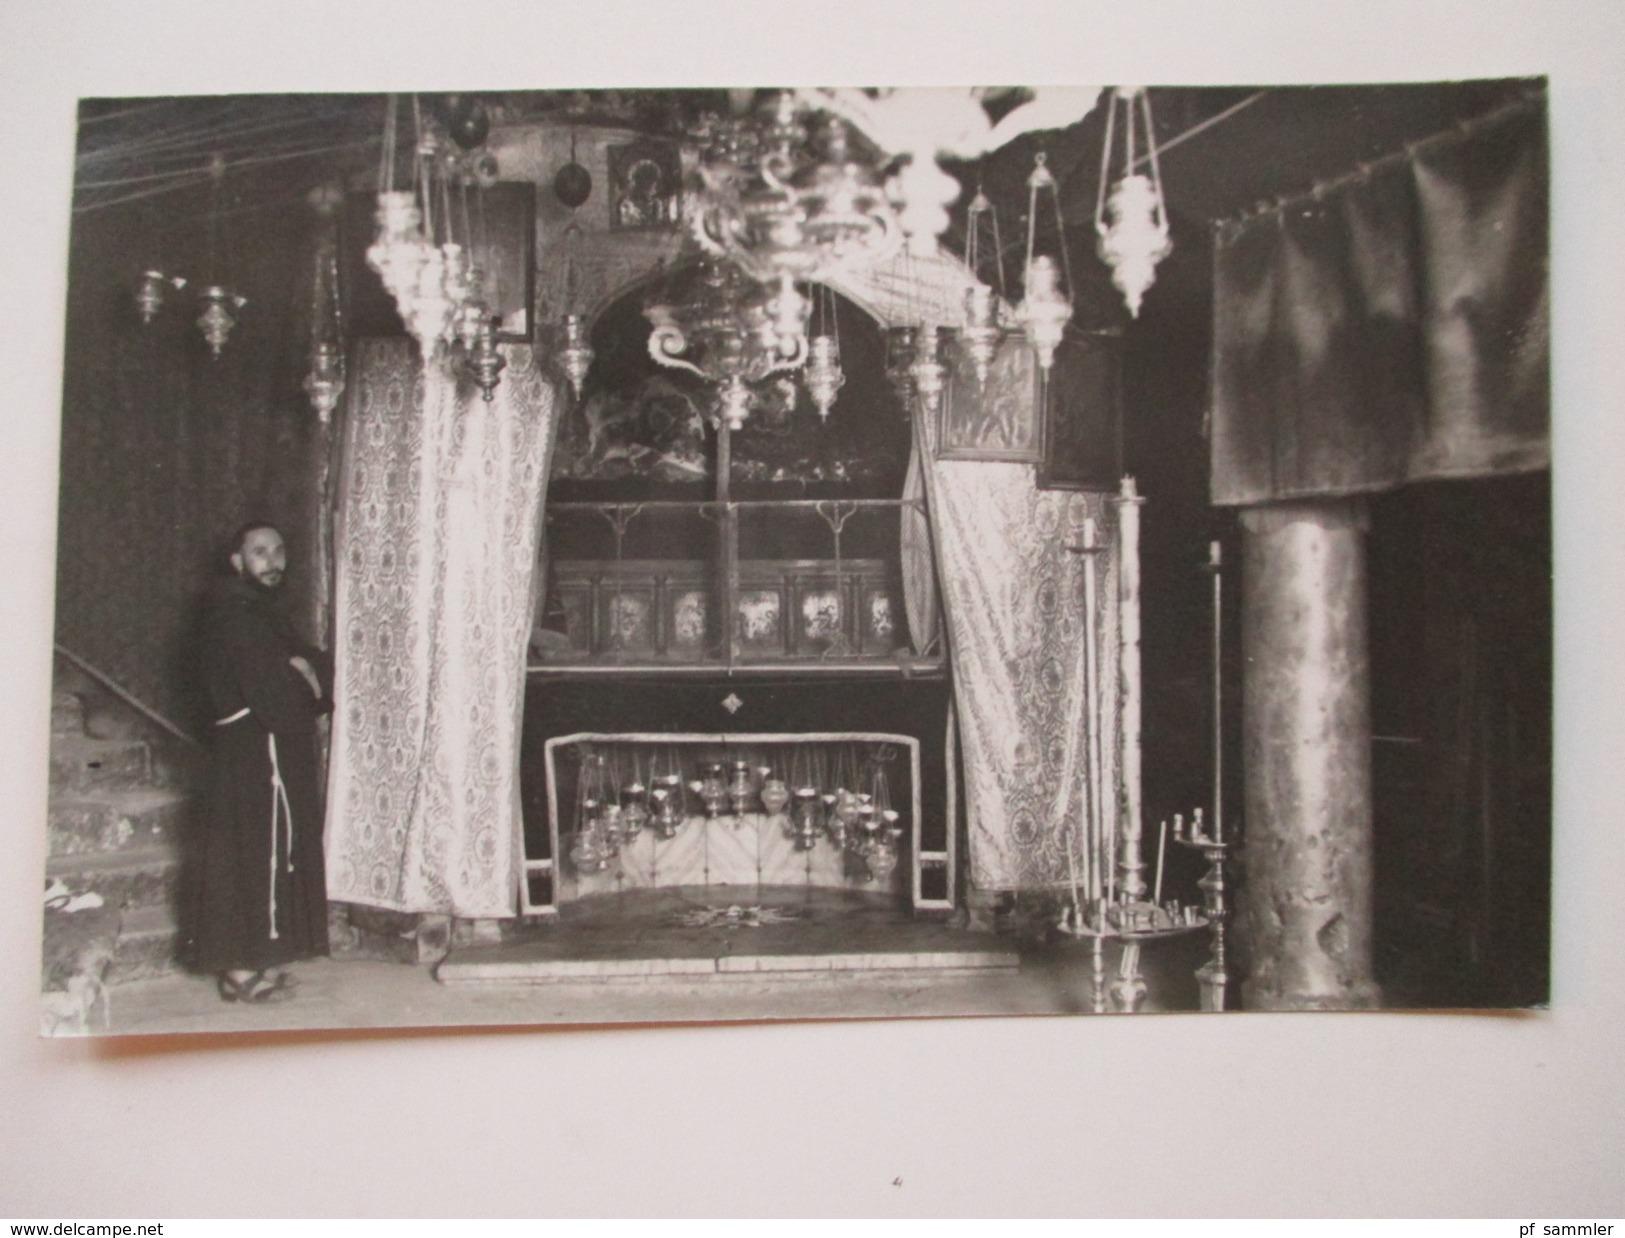 AK / Echtfoto 1933 Israel / Palestina / Jerusalem. Heilige Grabstädte. Bethlehem Grotto Of Nativity. Mönch - Palästina